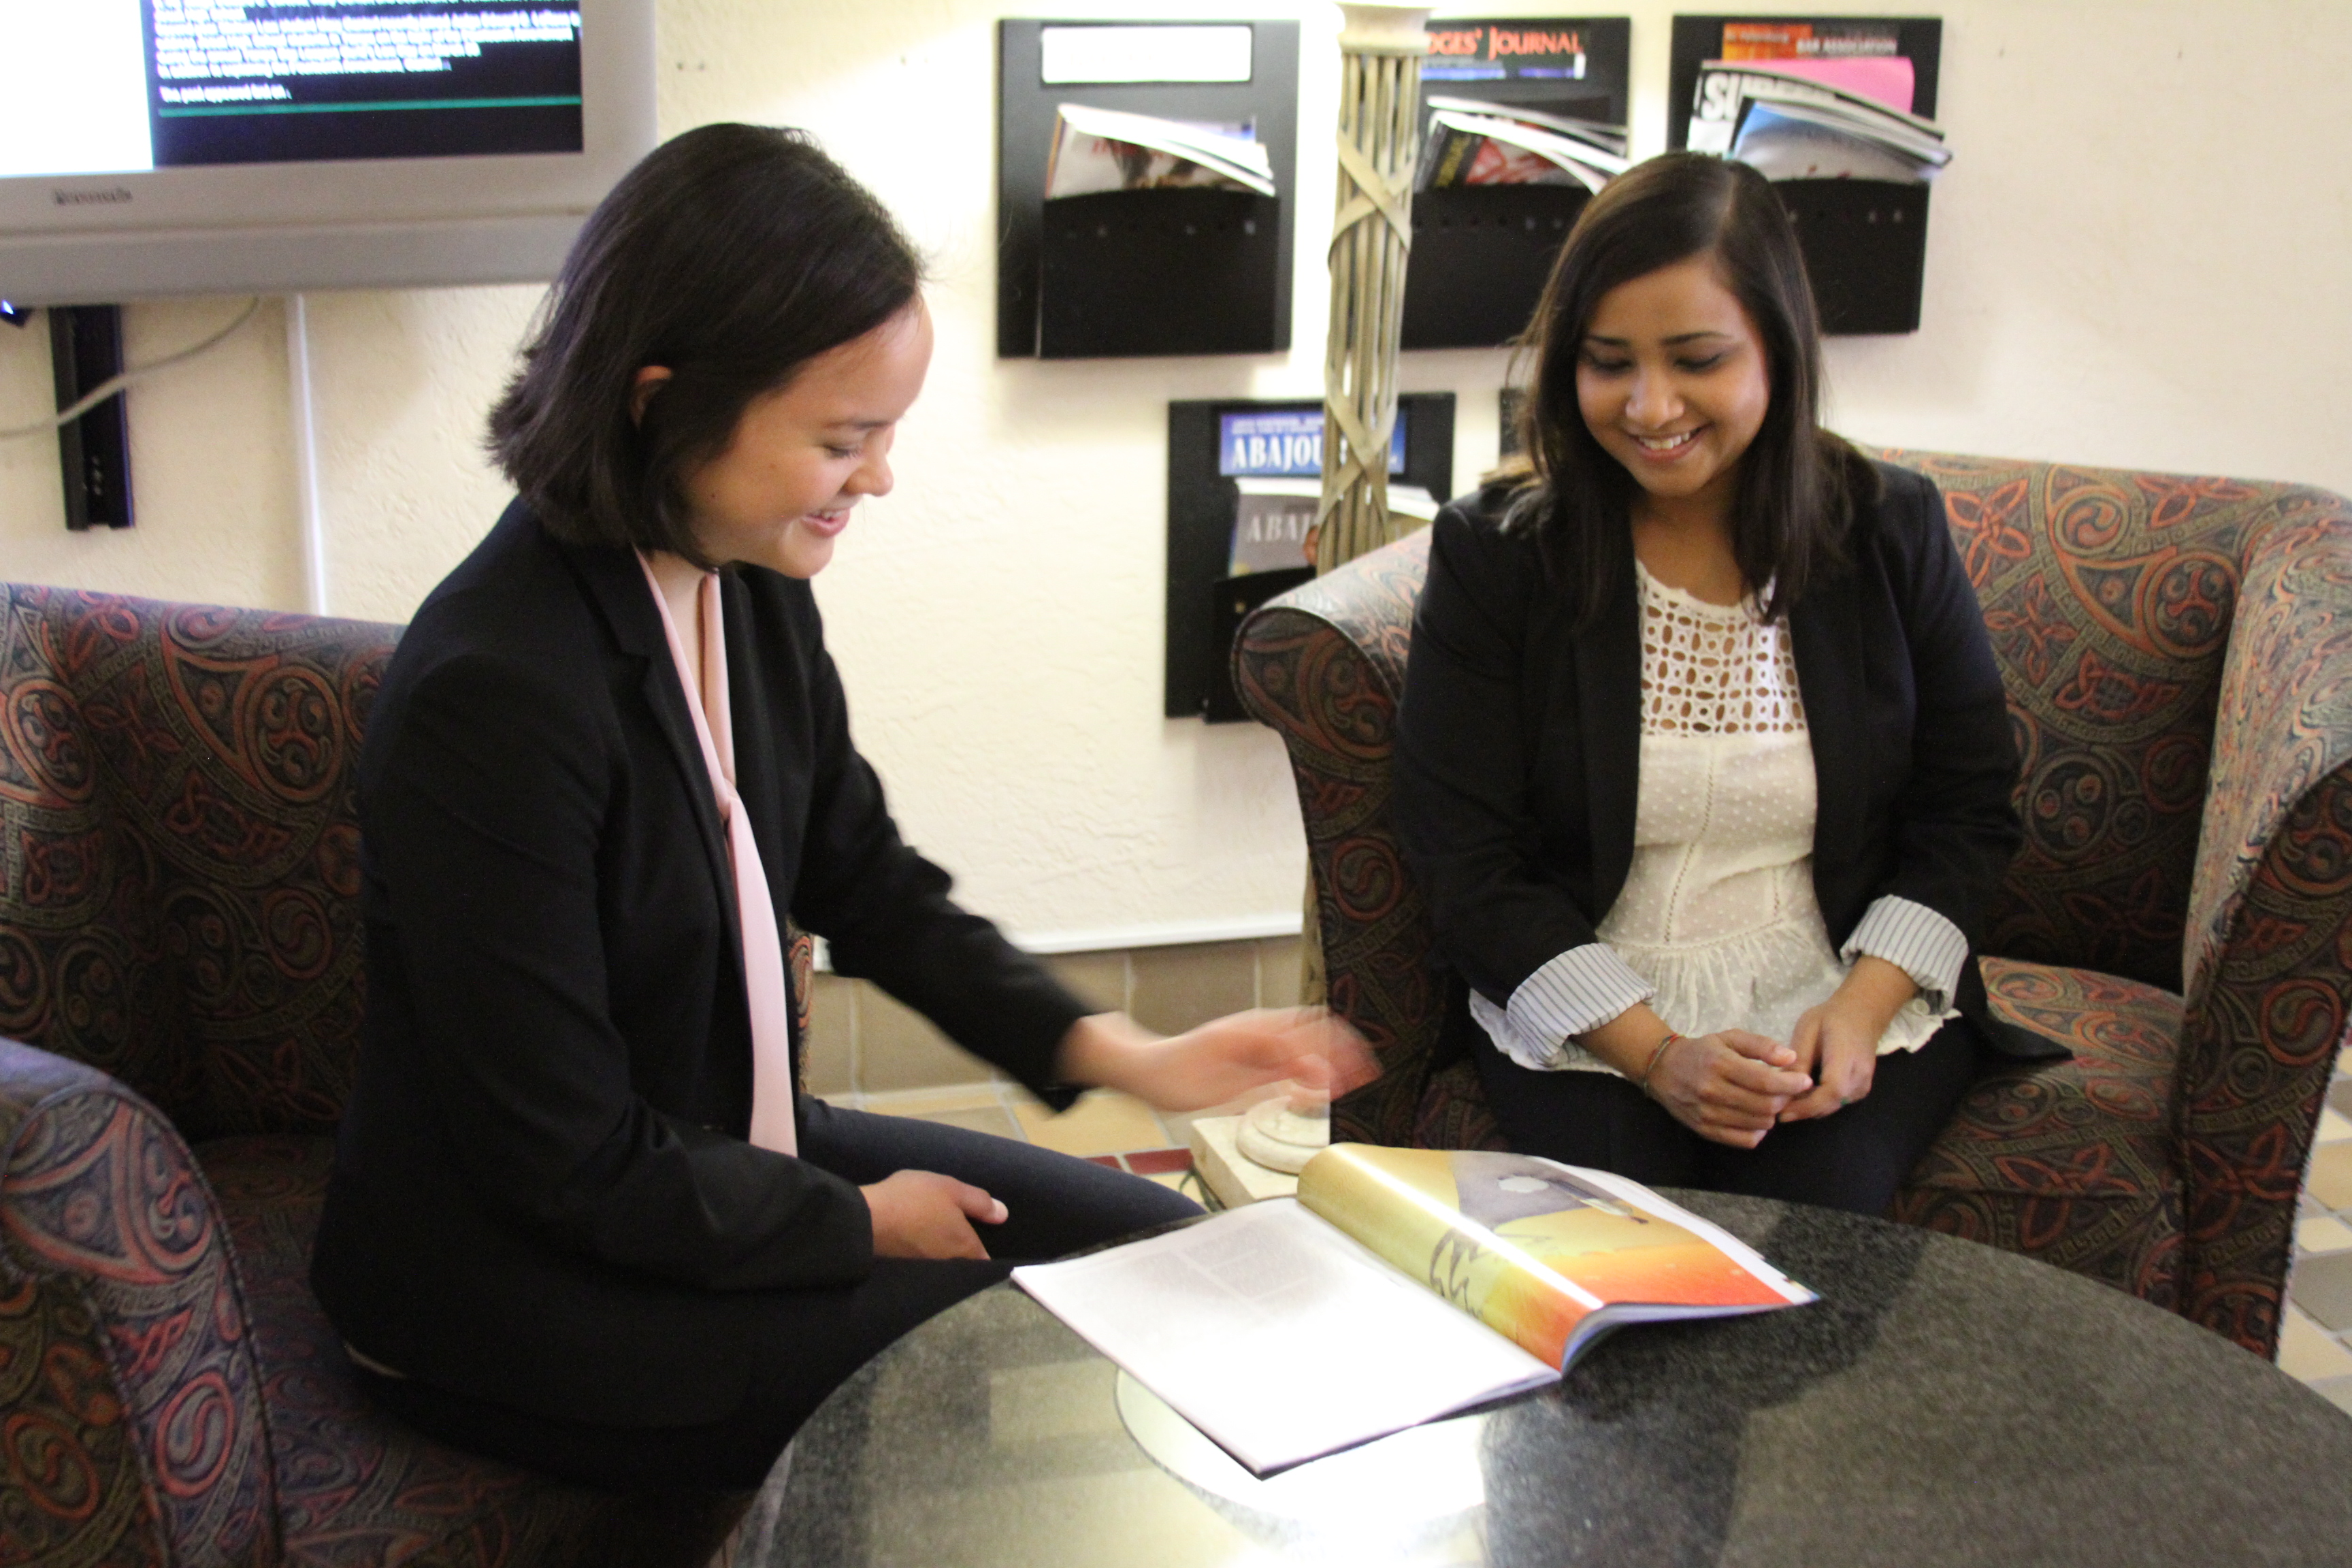 Khai Su and Riya Khan worked together to present during the model U.N. session.